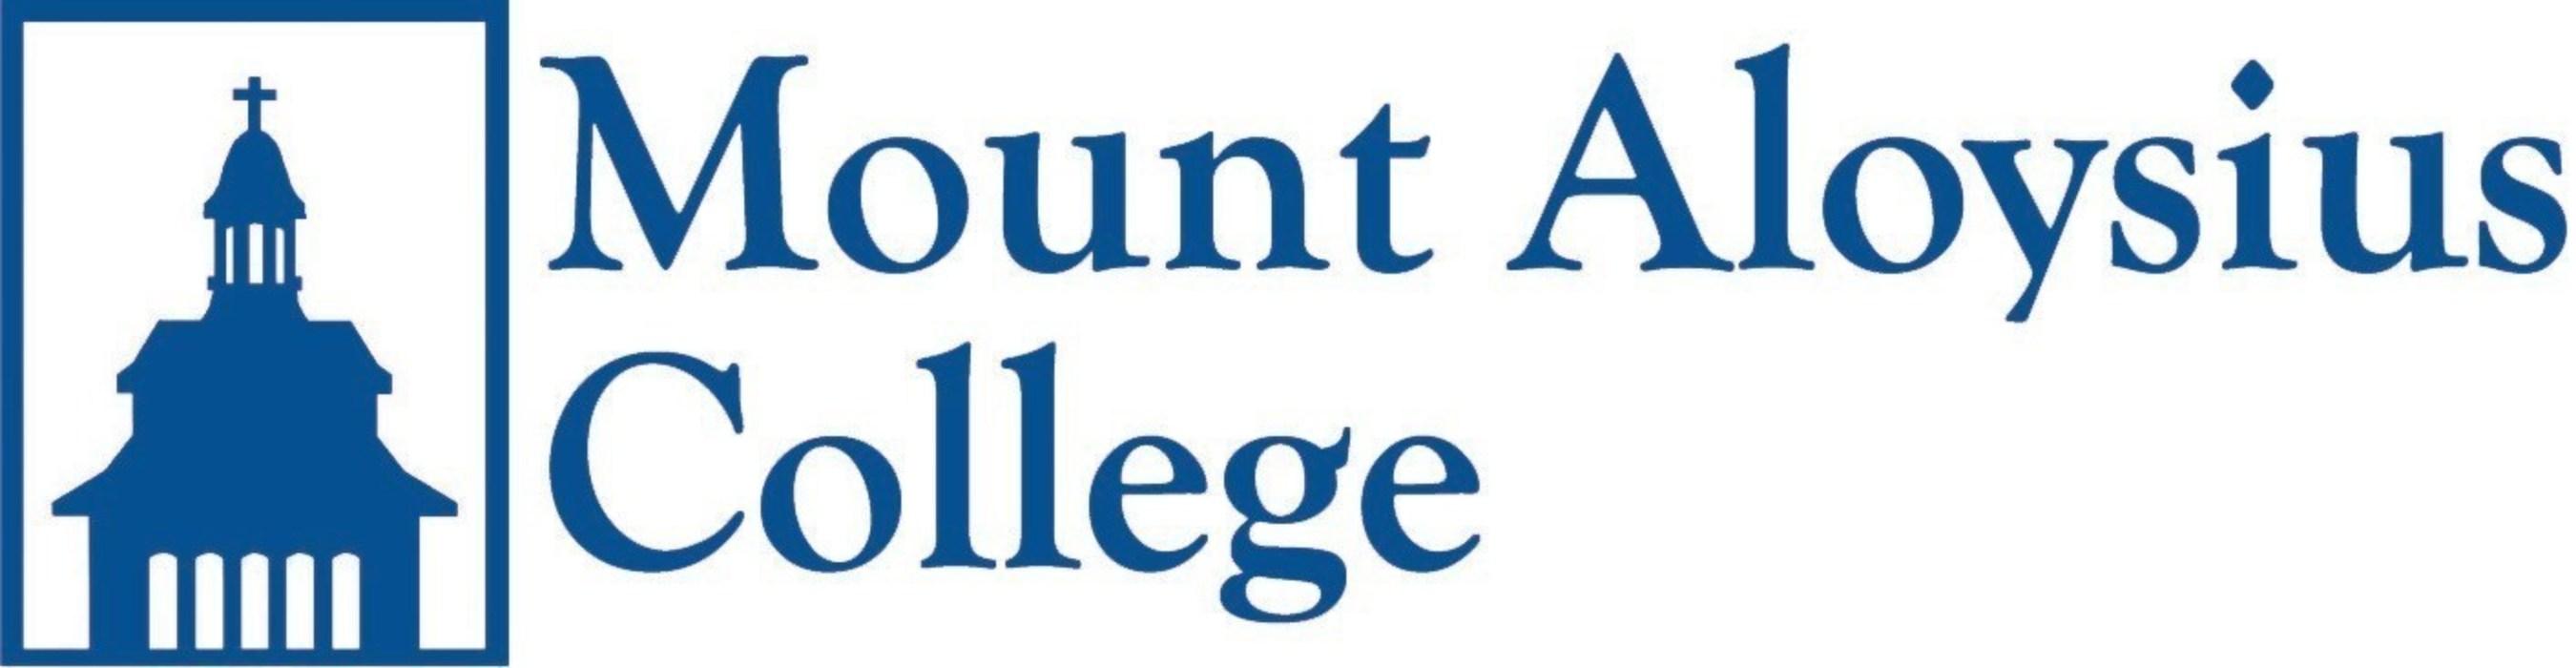 Mount Aloysius College logo